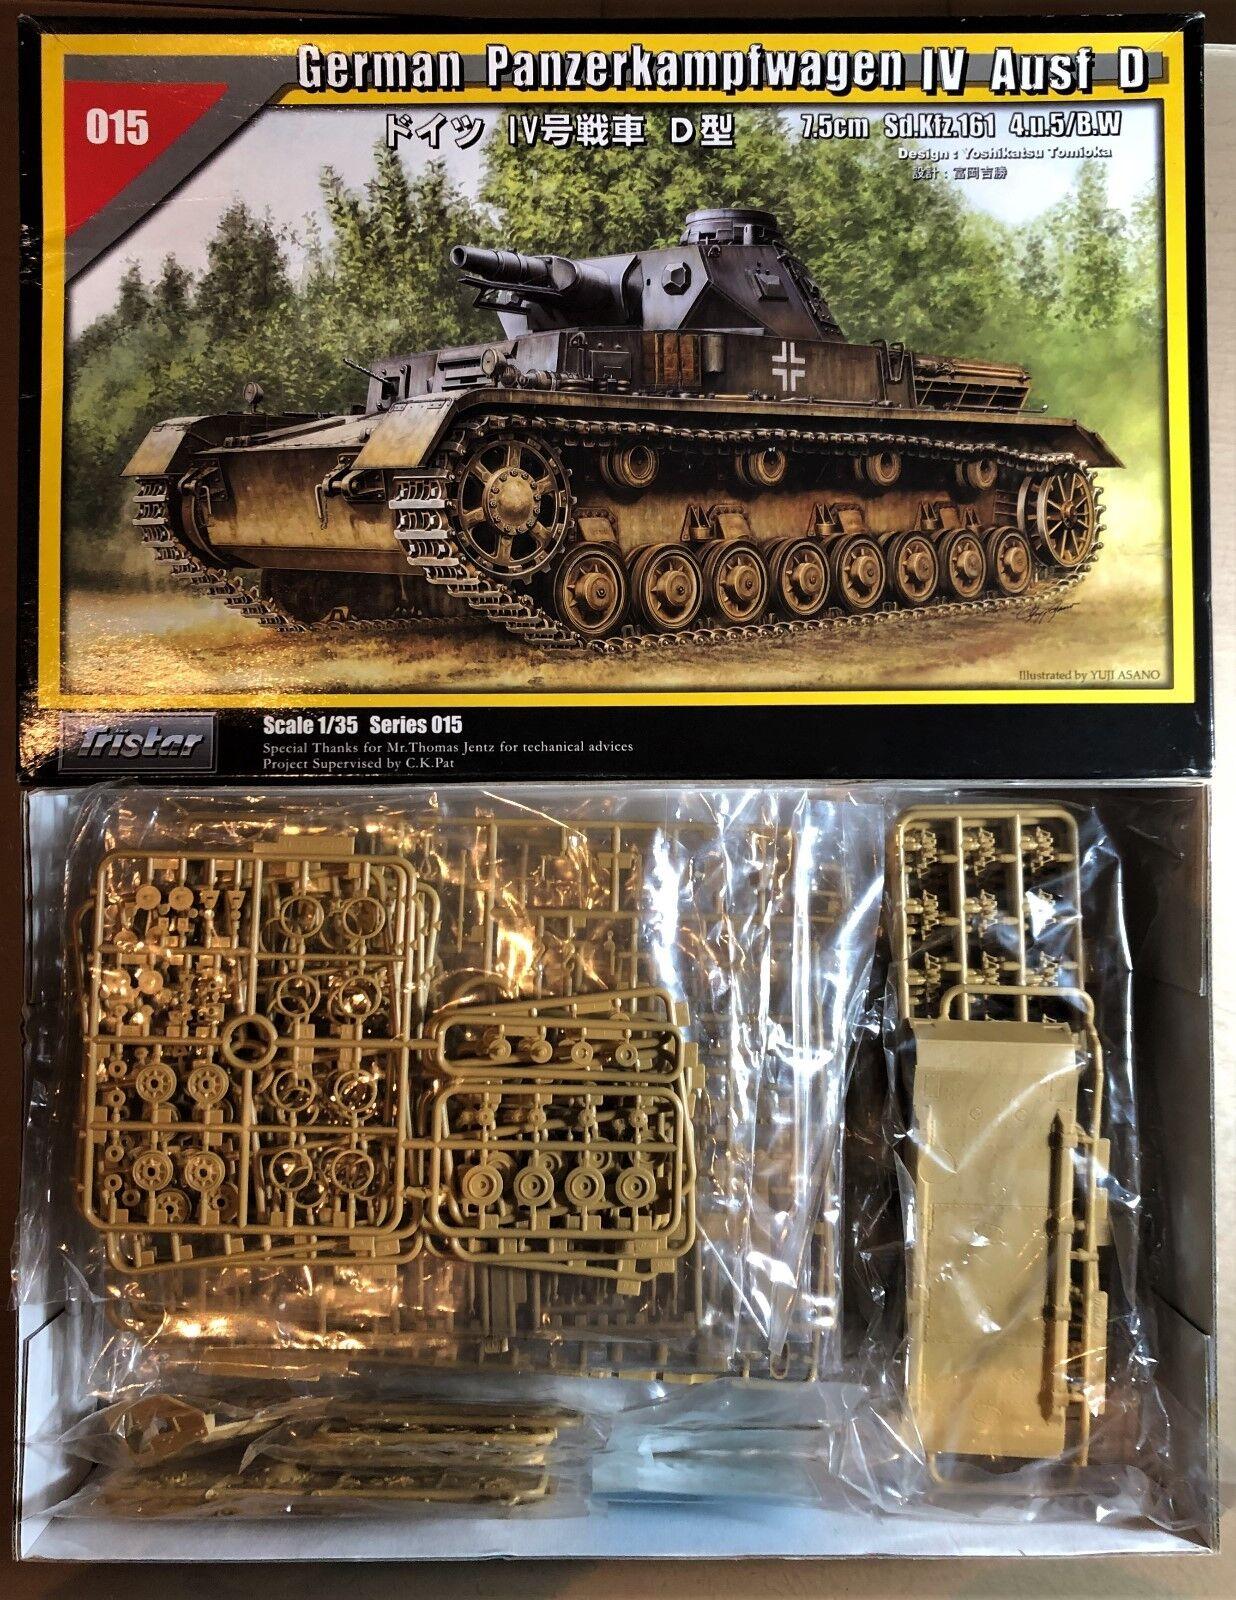 Tristar 35015-German Panzerkampfwagen IV Ausf D - 1 35 Plastic Kit